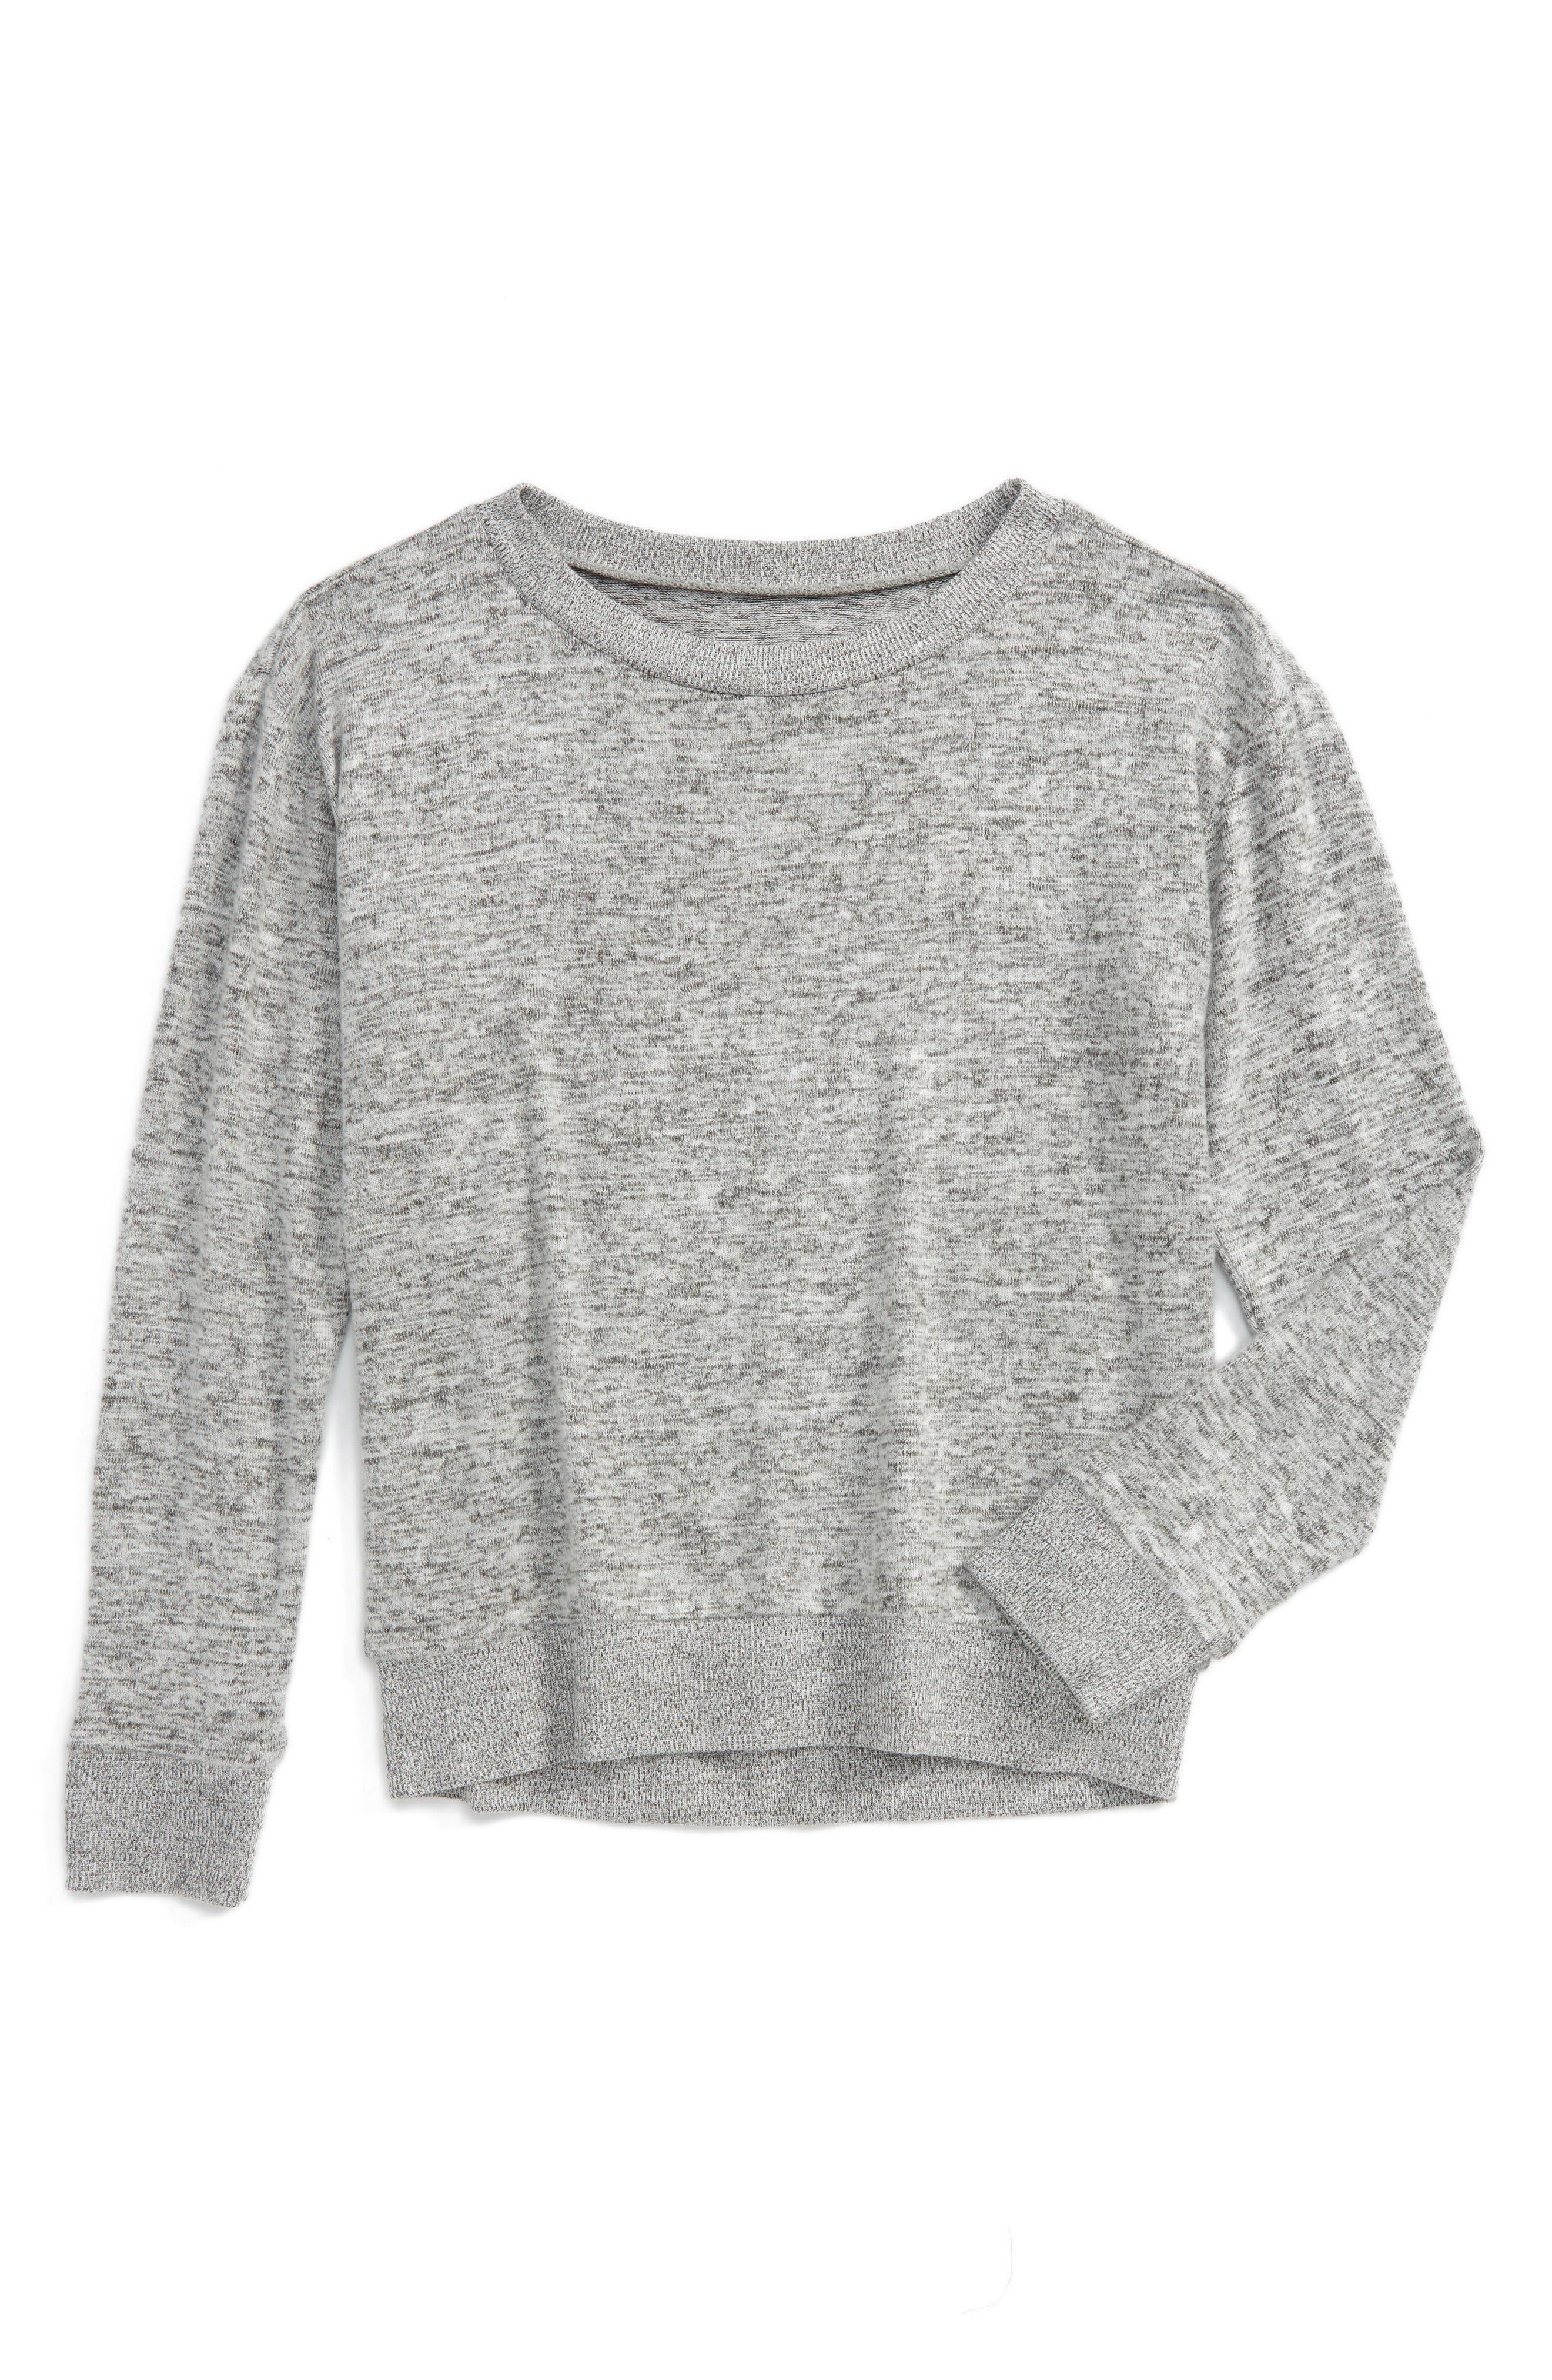 Alternate Image 1 Selected - Zella Girl Supersoft Sweater (Little Girls & Big Girls)